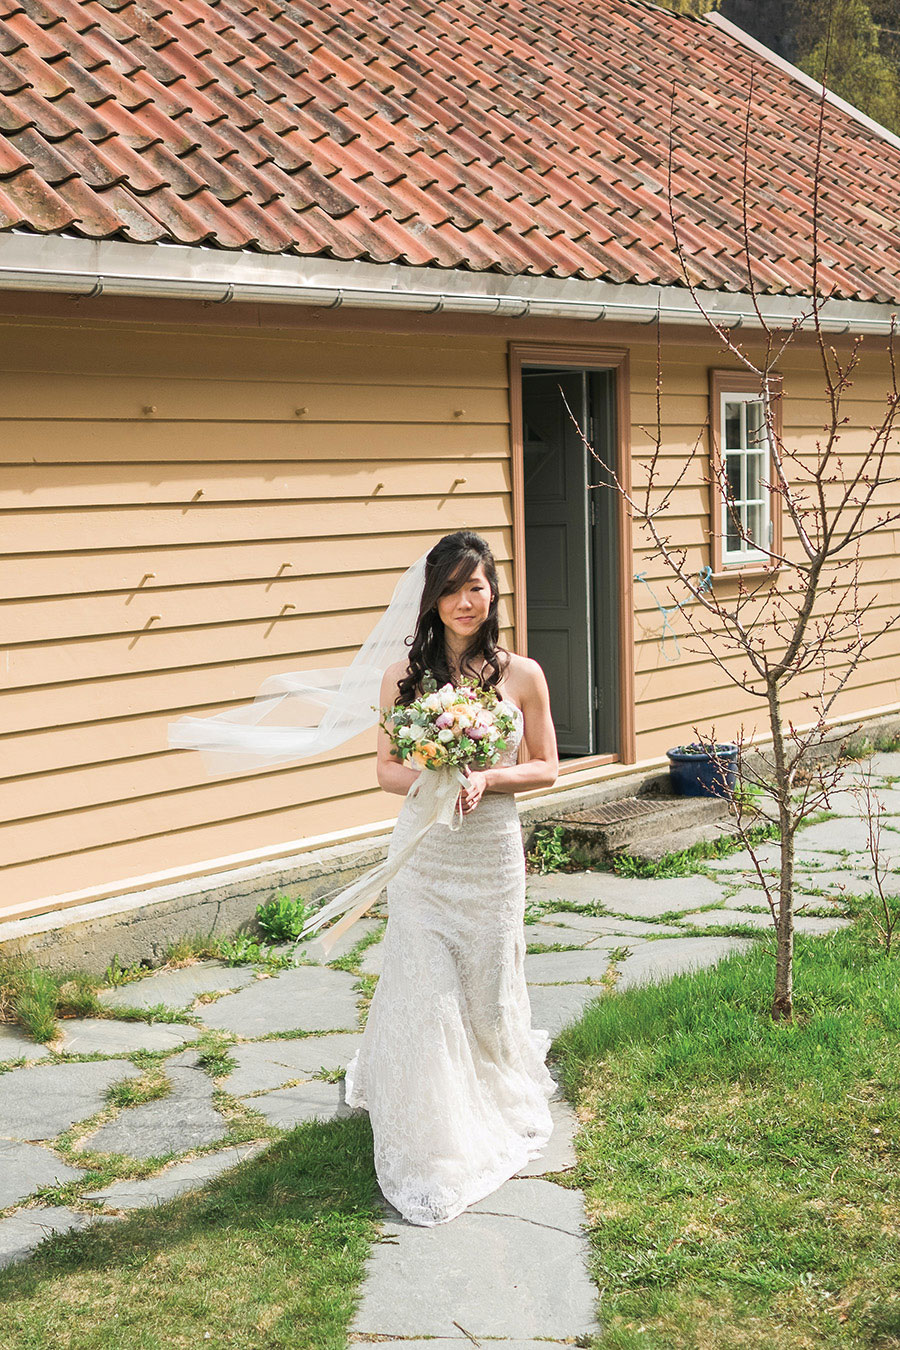 breathtaking-scenic-wedding-in-norway20160914_0105